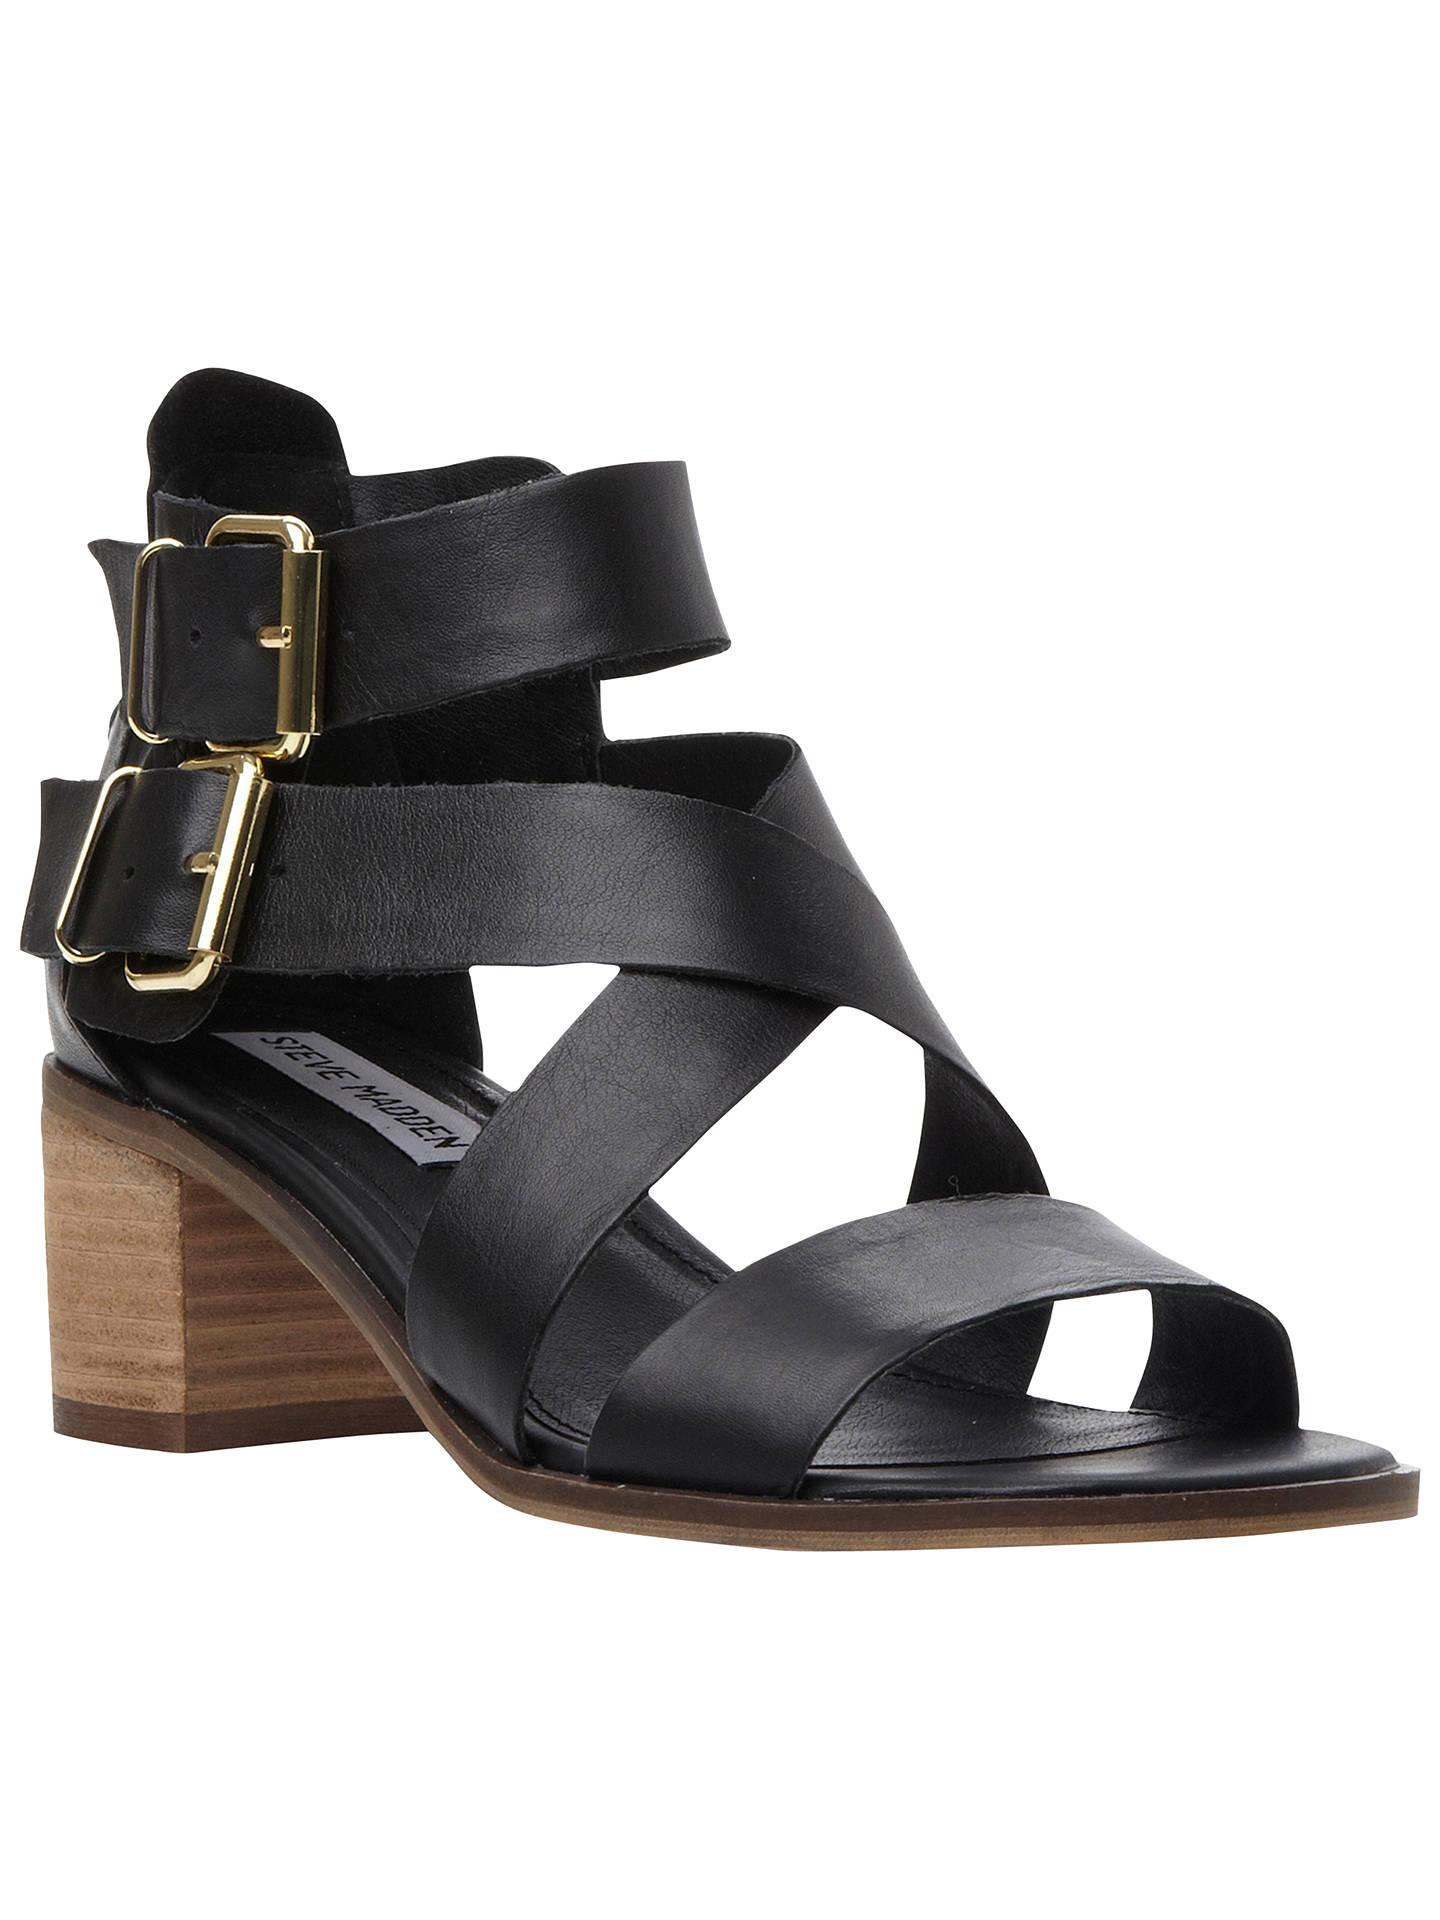 04497b5389b Steve Madden Rosana Strappy Leather Block Heel Sandals at John Lewis ...